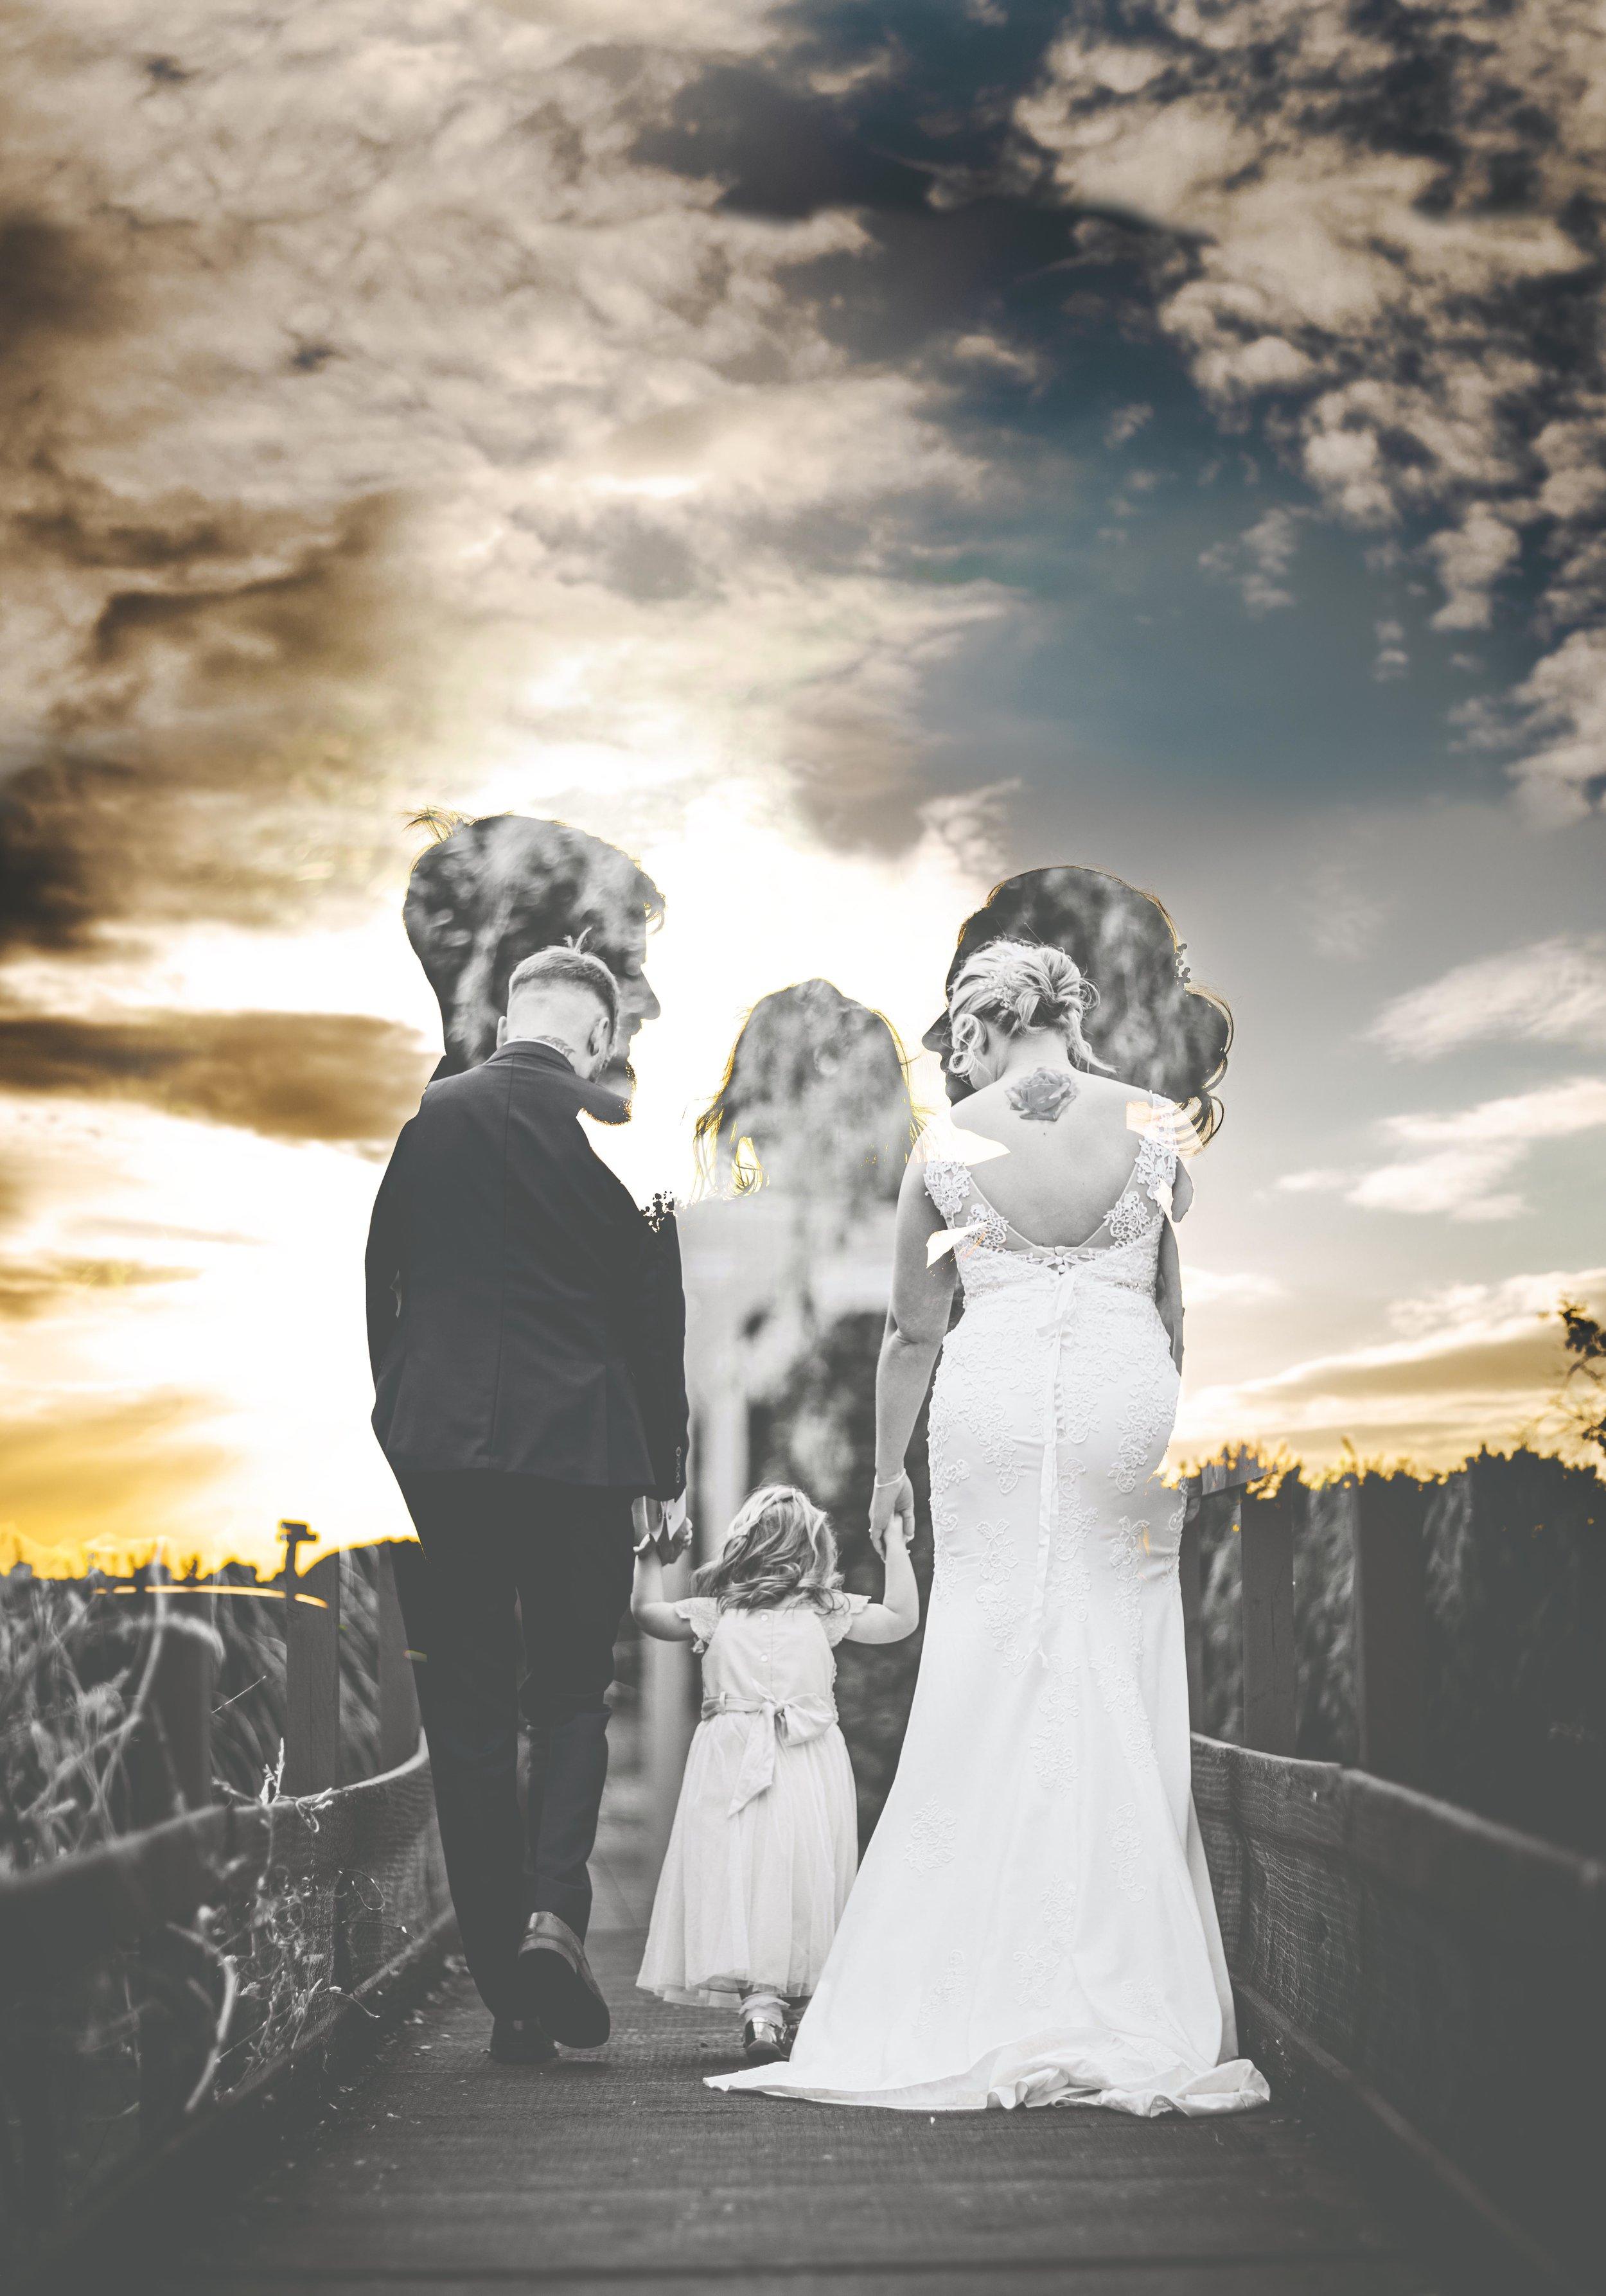 Love, Family, Wedding, Bride, Groom, Clouds, Perfect Wedding, Yorkshire Wedding.